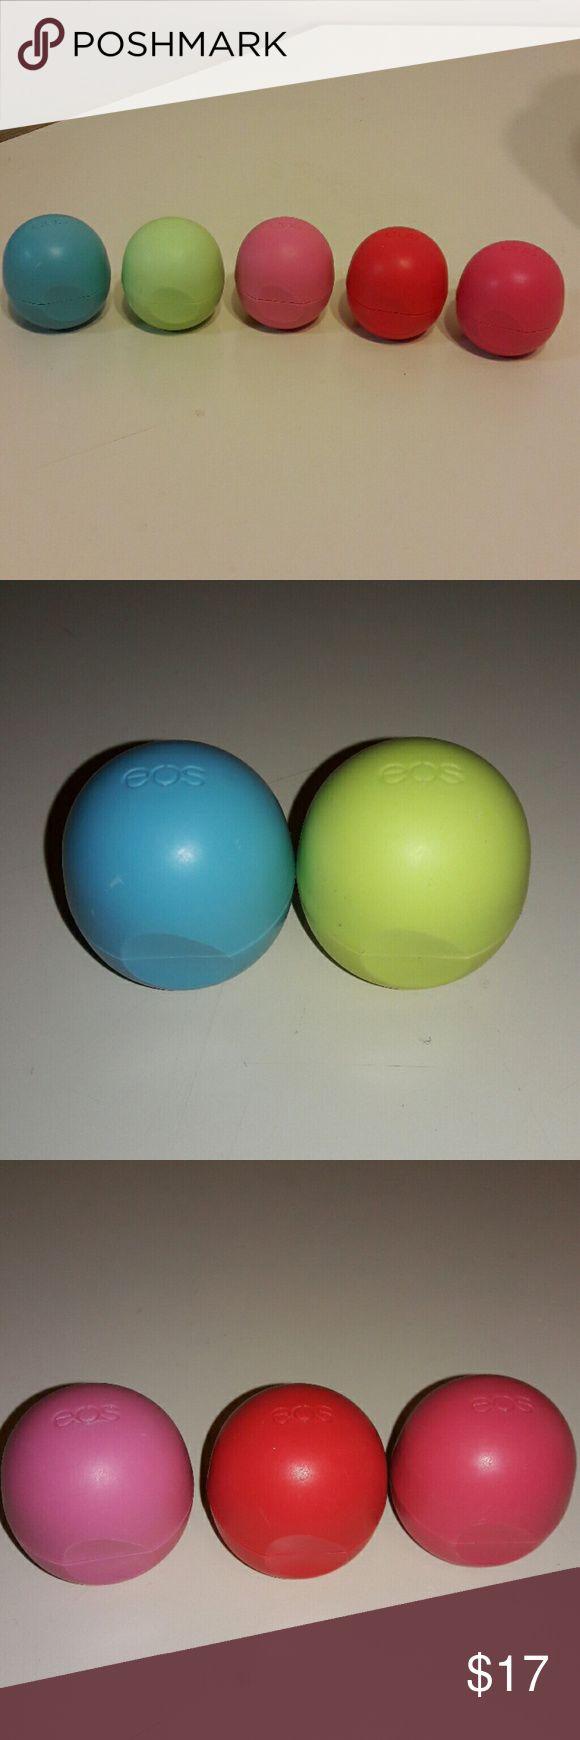 Lip Balm Bundle EOS Lip Balm Set: * Blueberry Acai * Honeysuckle Honeydew * Strawberry Sorbet * Summer Fruit * Watermelon Wonderland EOS Makeup Lip Balm & Gloss